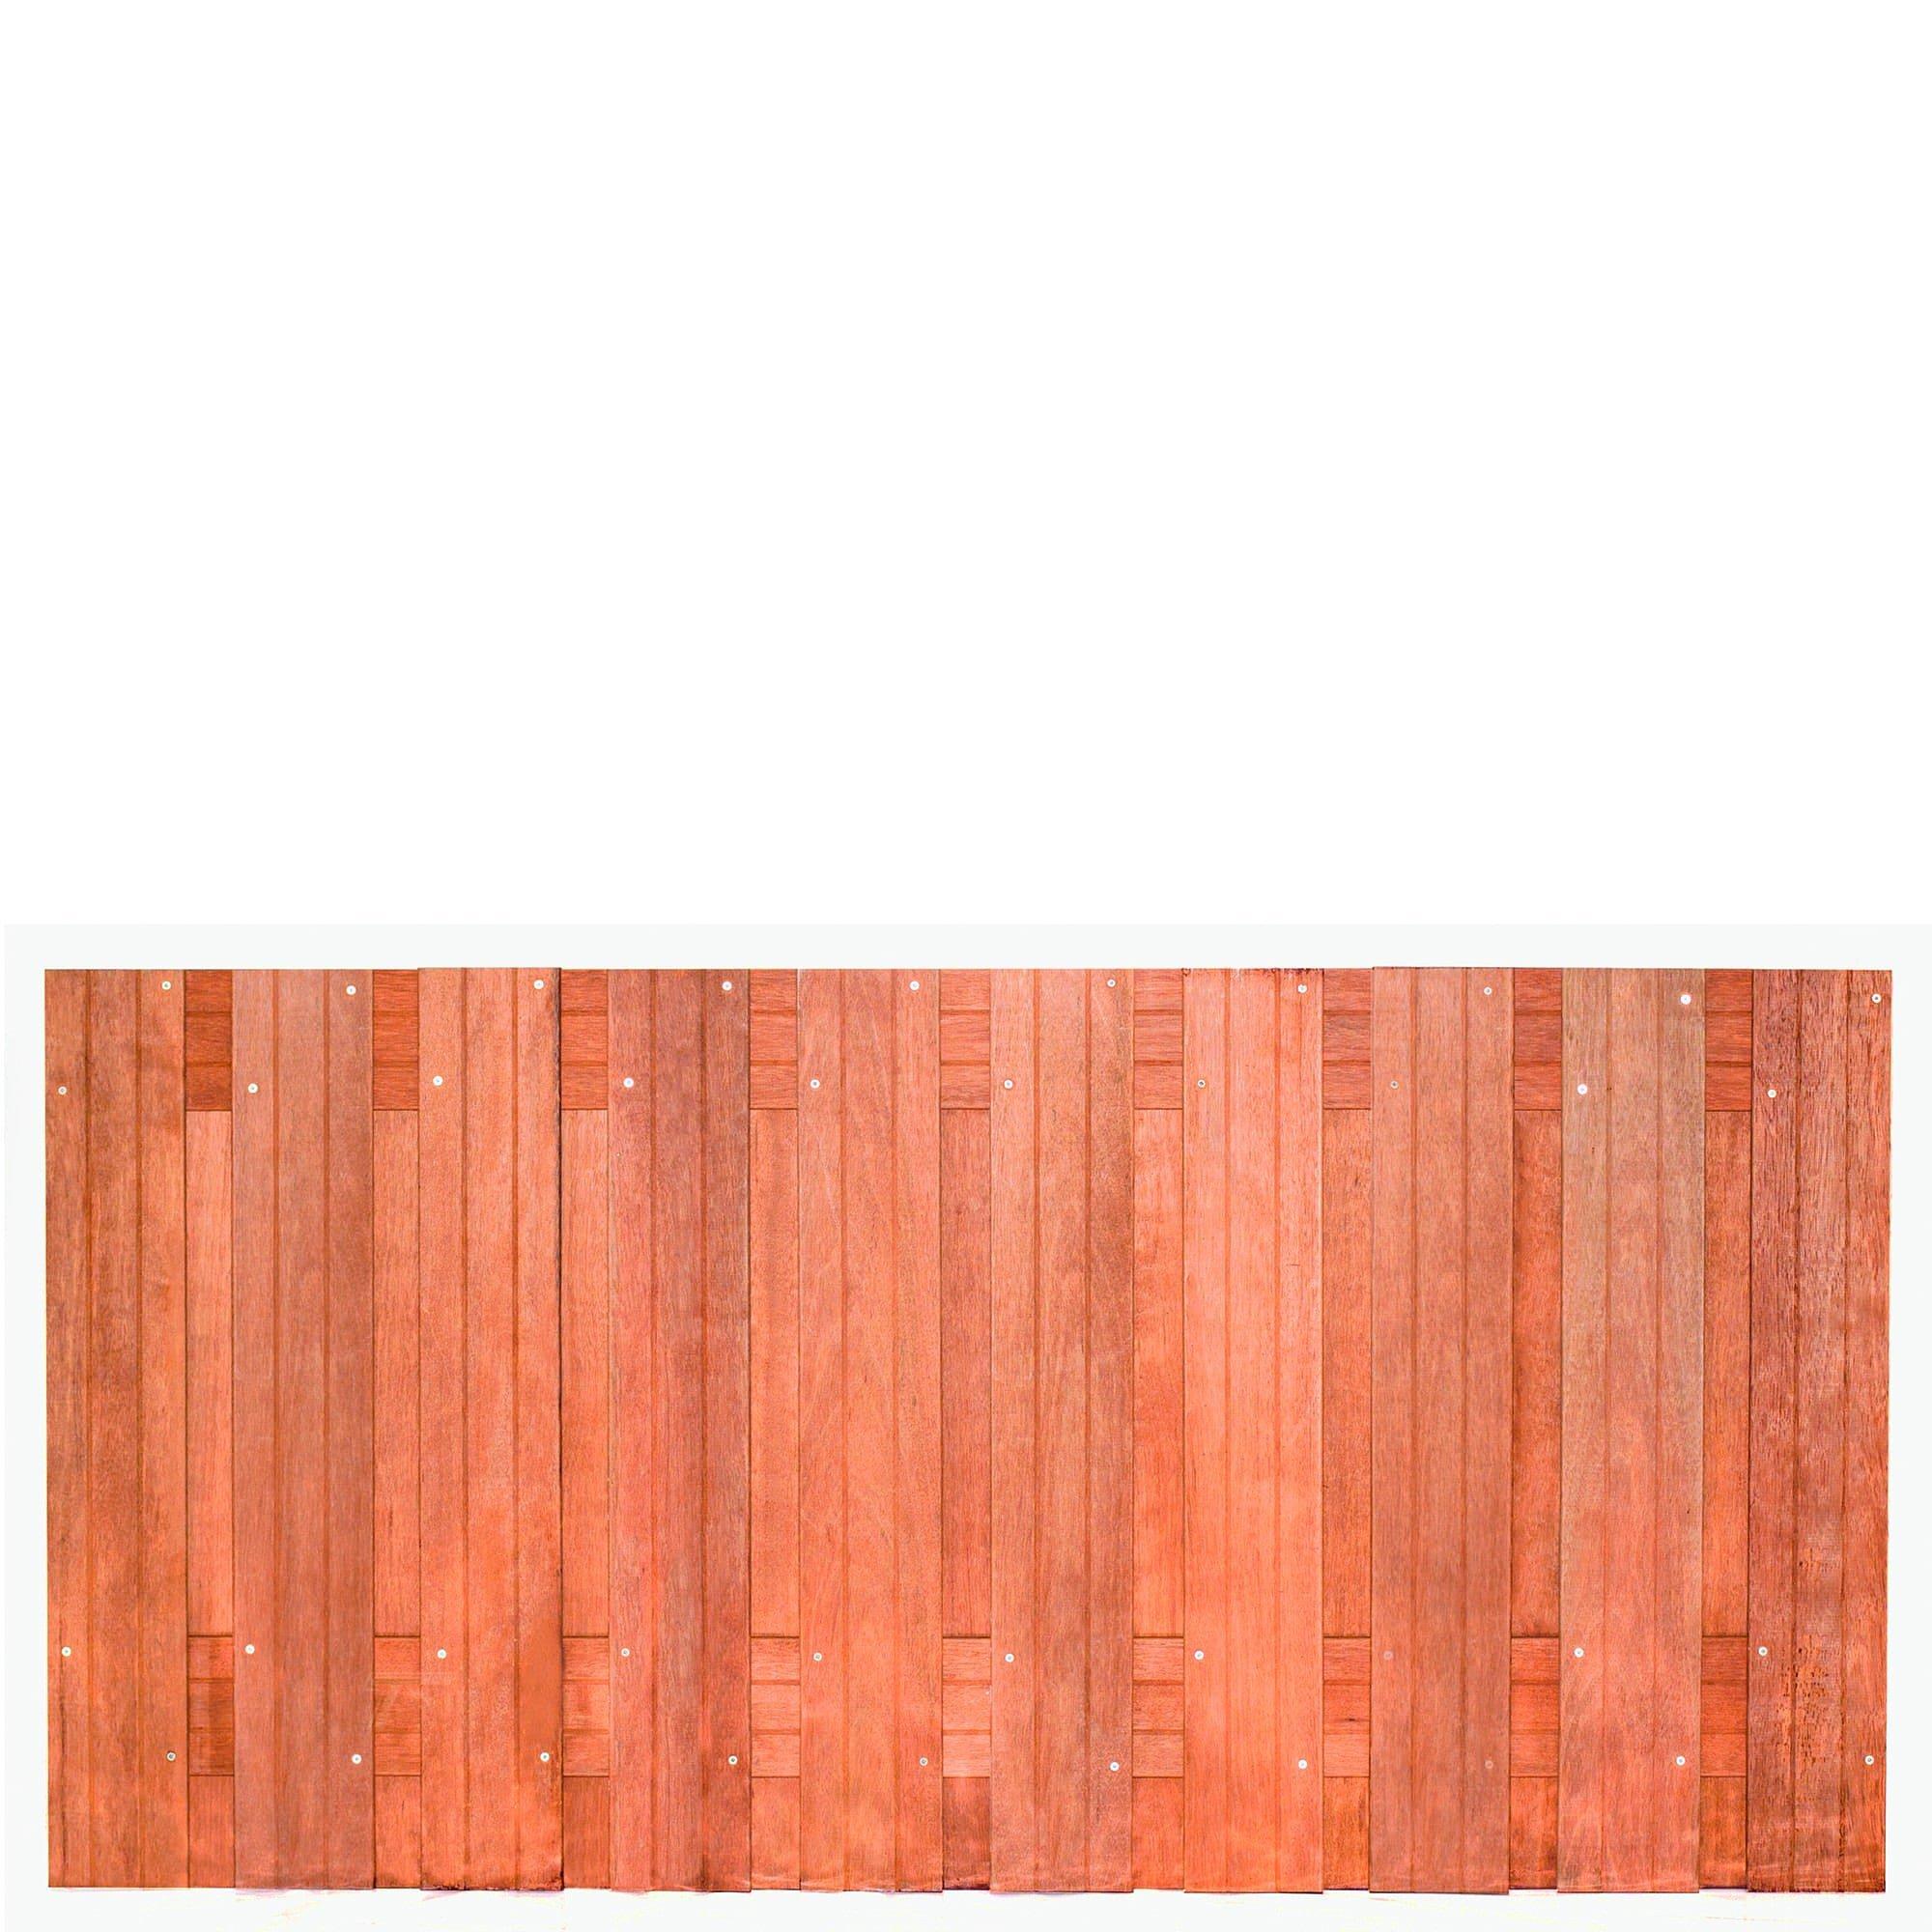 Hardhouten privacy schutting recht 90 x 180 cm. Type: Dronten 90